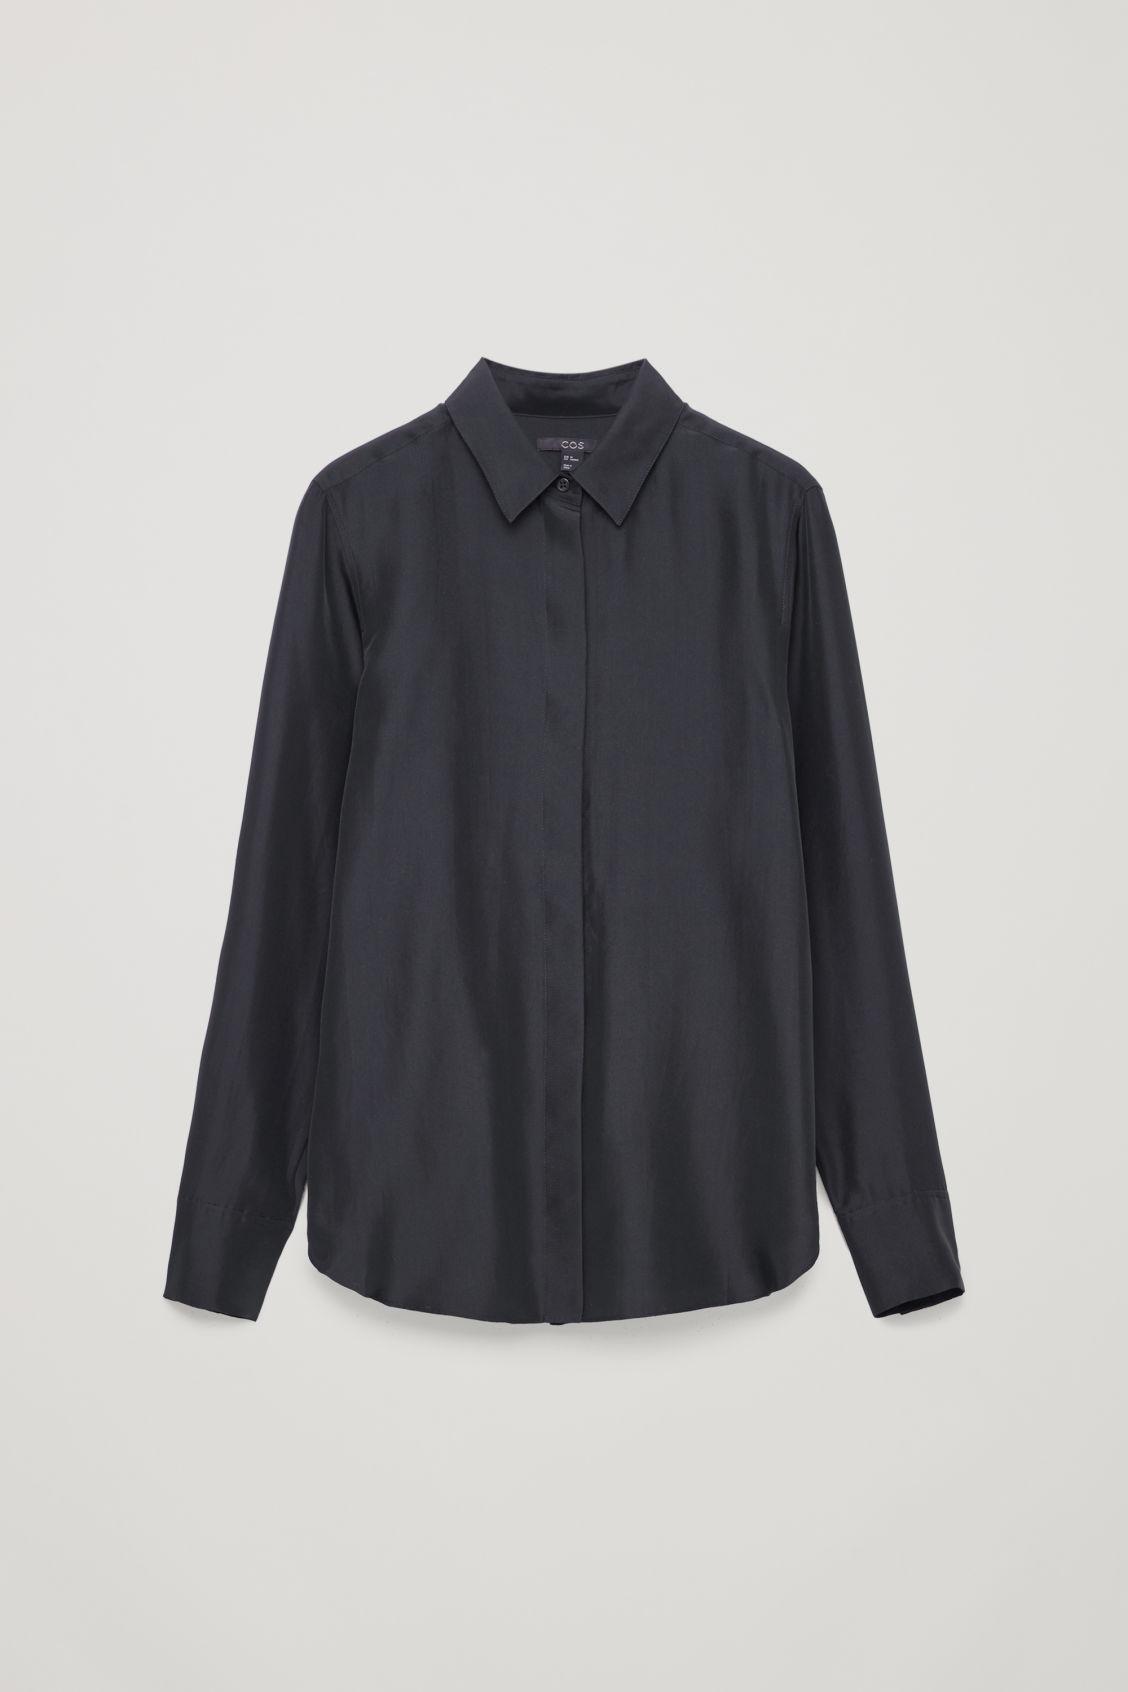 2af8022ea6a8d Lyst - COS Silk Shirt in Blue